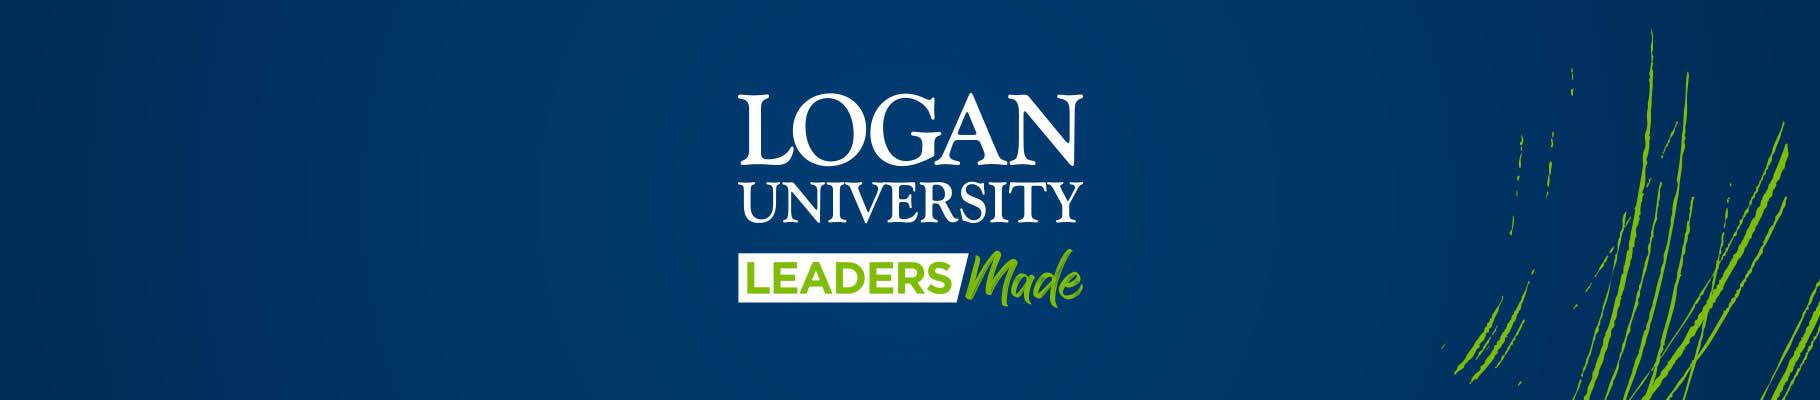 Logan University logo on blue wide